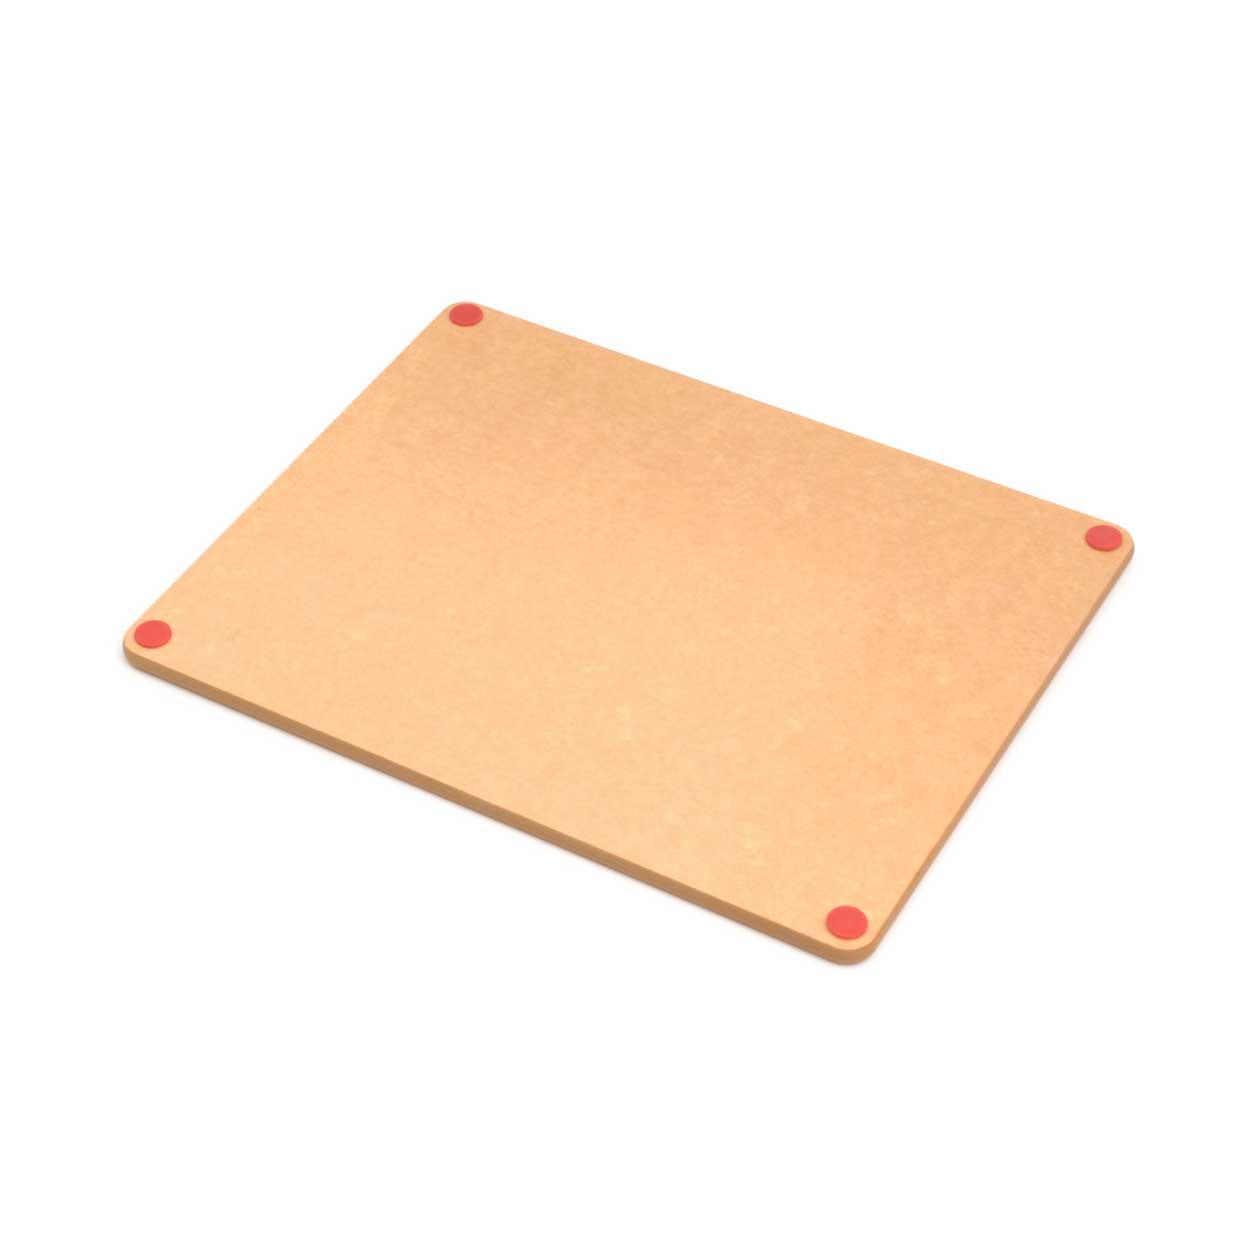 Victorinox Swiss Army 622-14110107 cutting board, wood